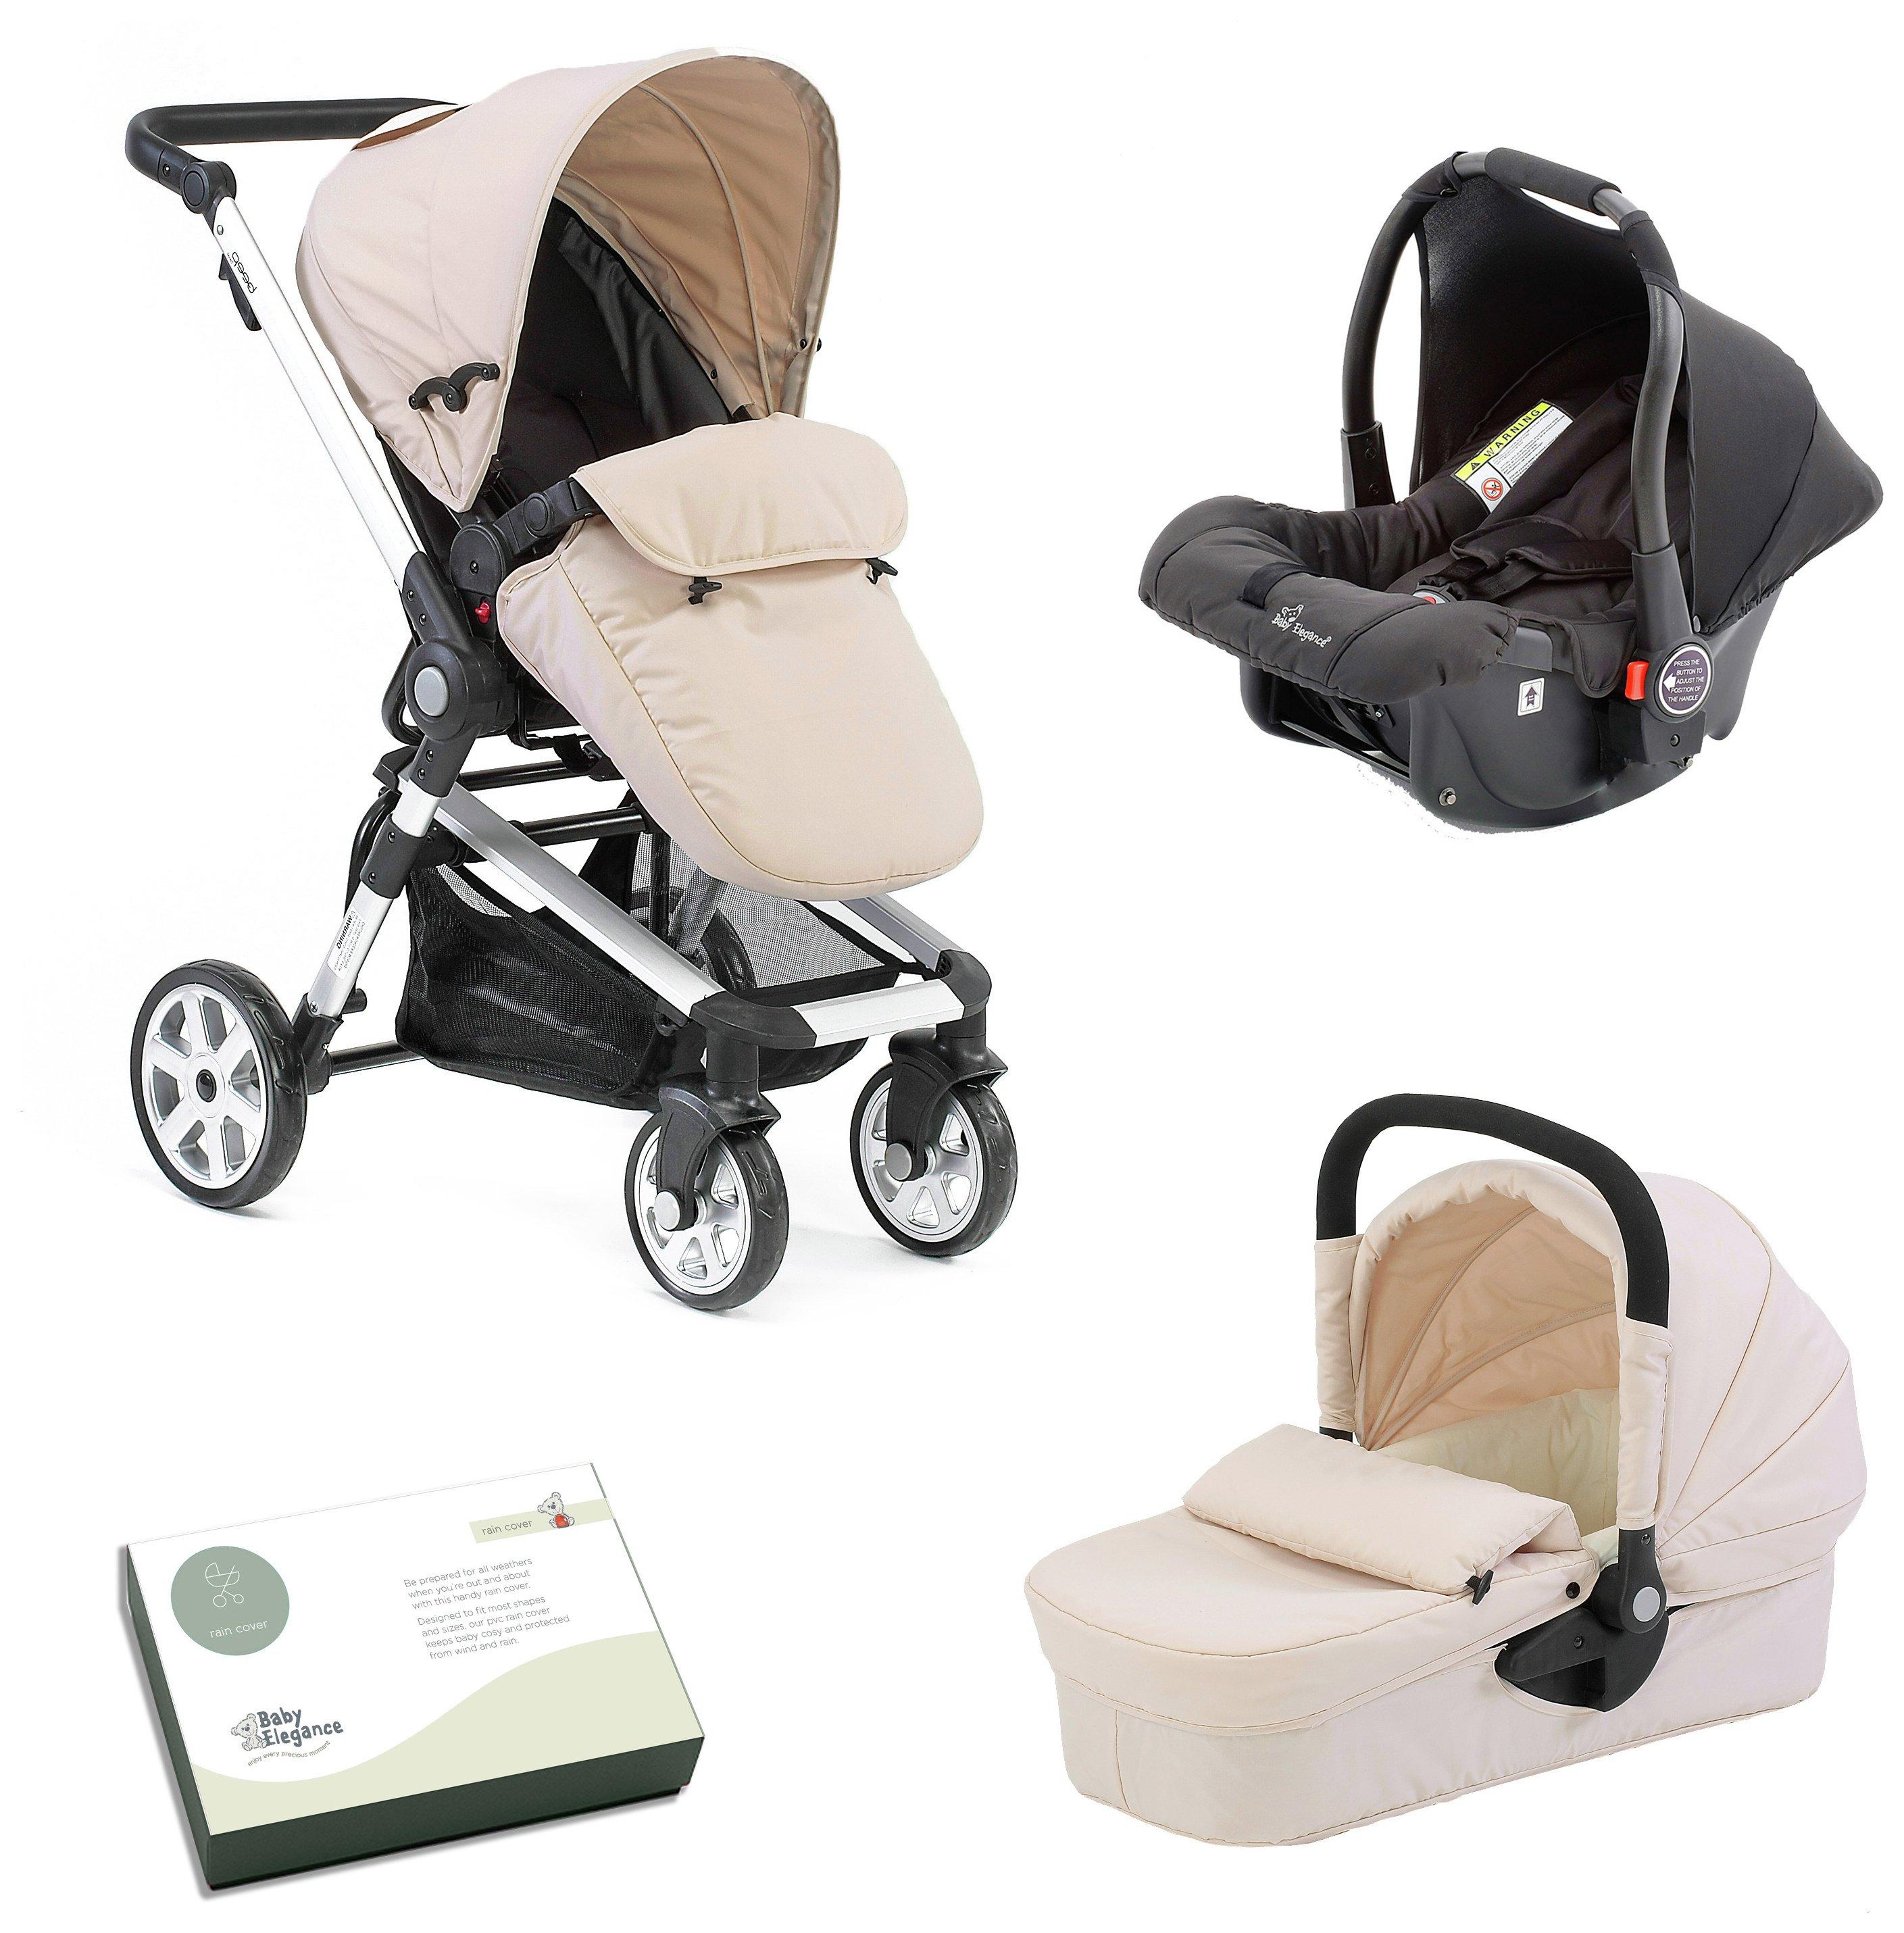 Image of Baby Elegance Beep Twist Travel System - Cream.